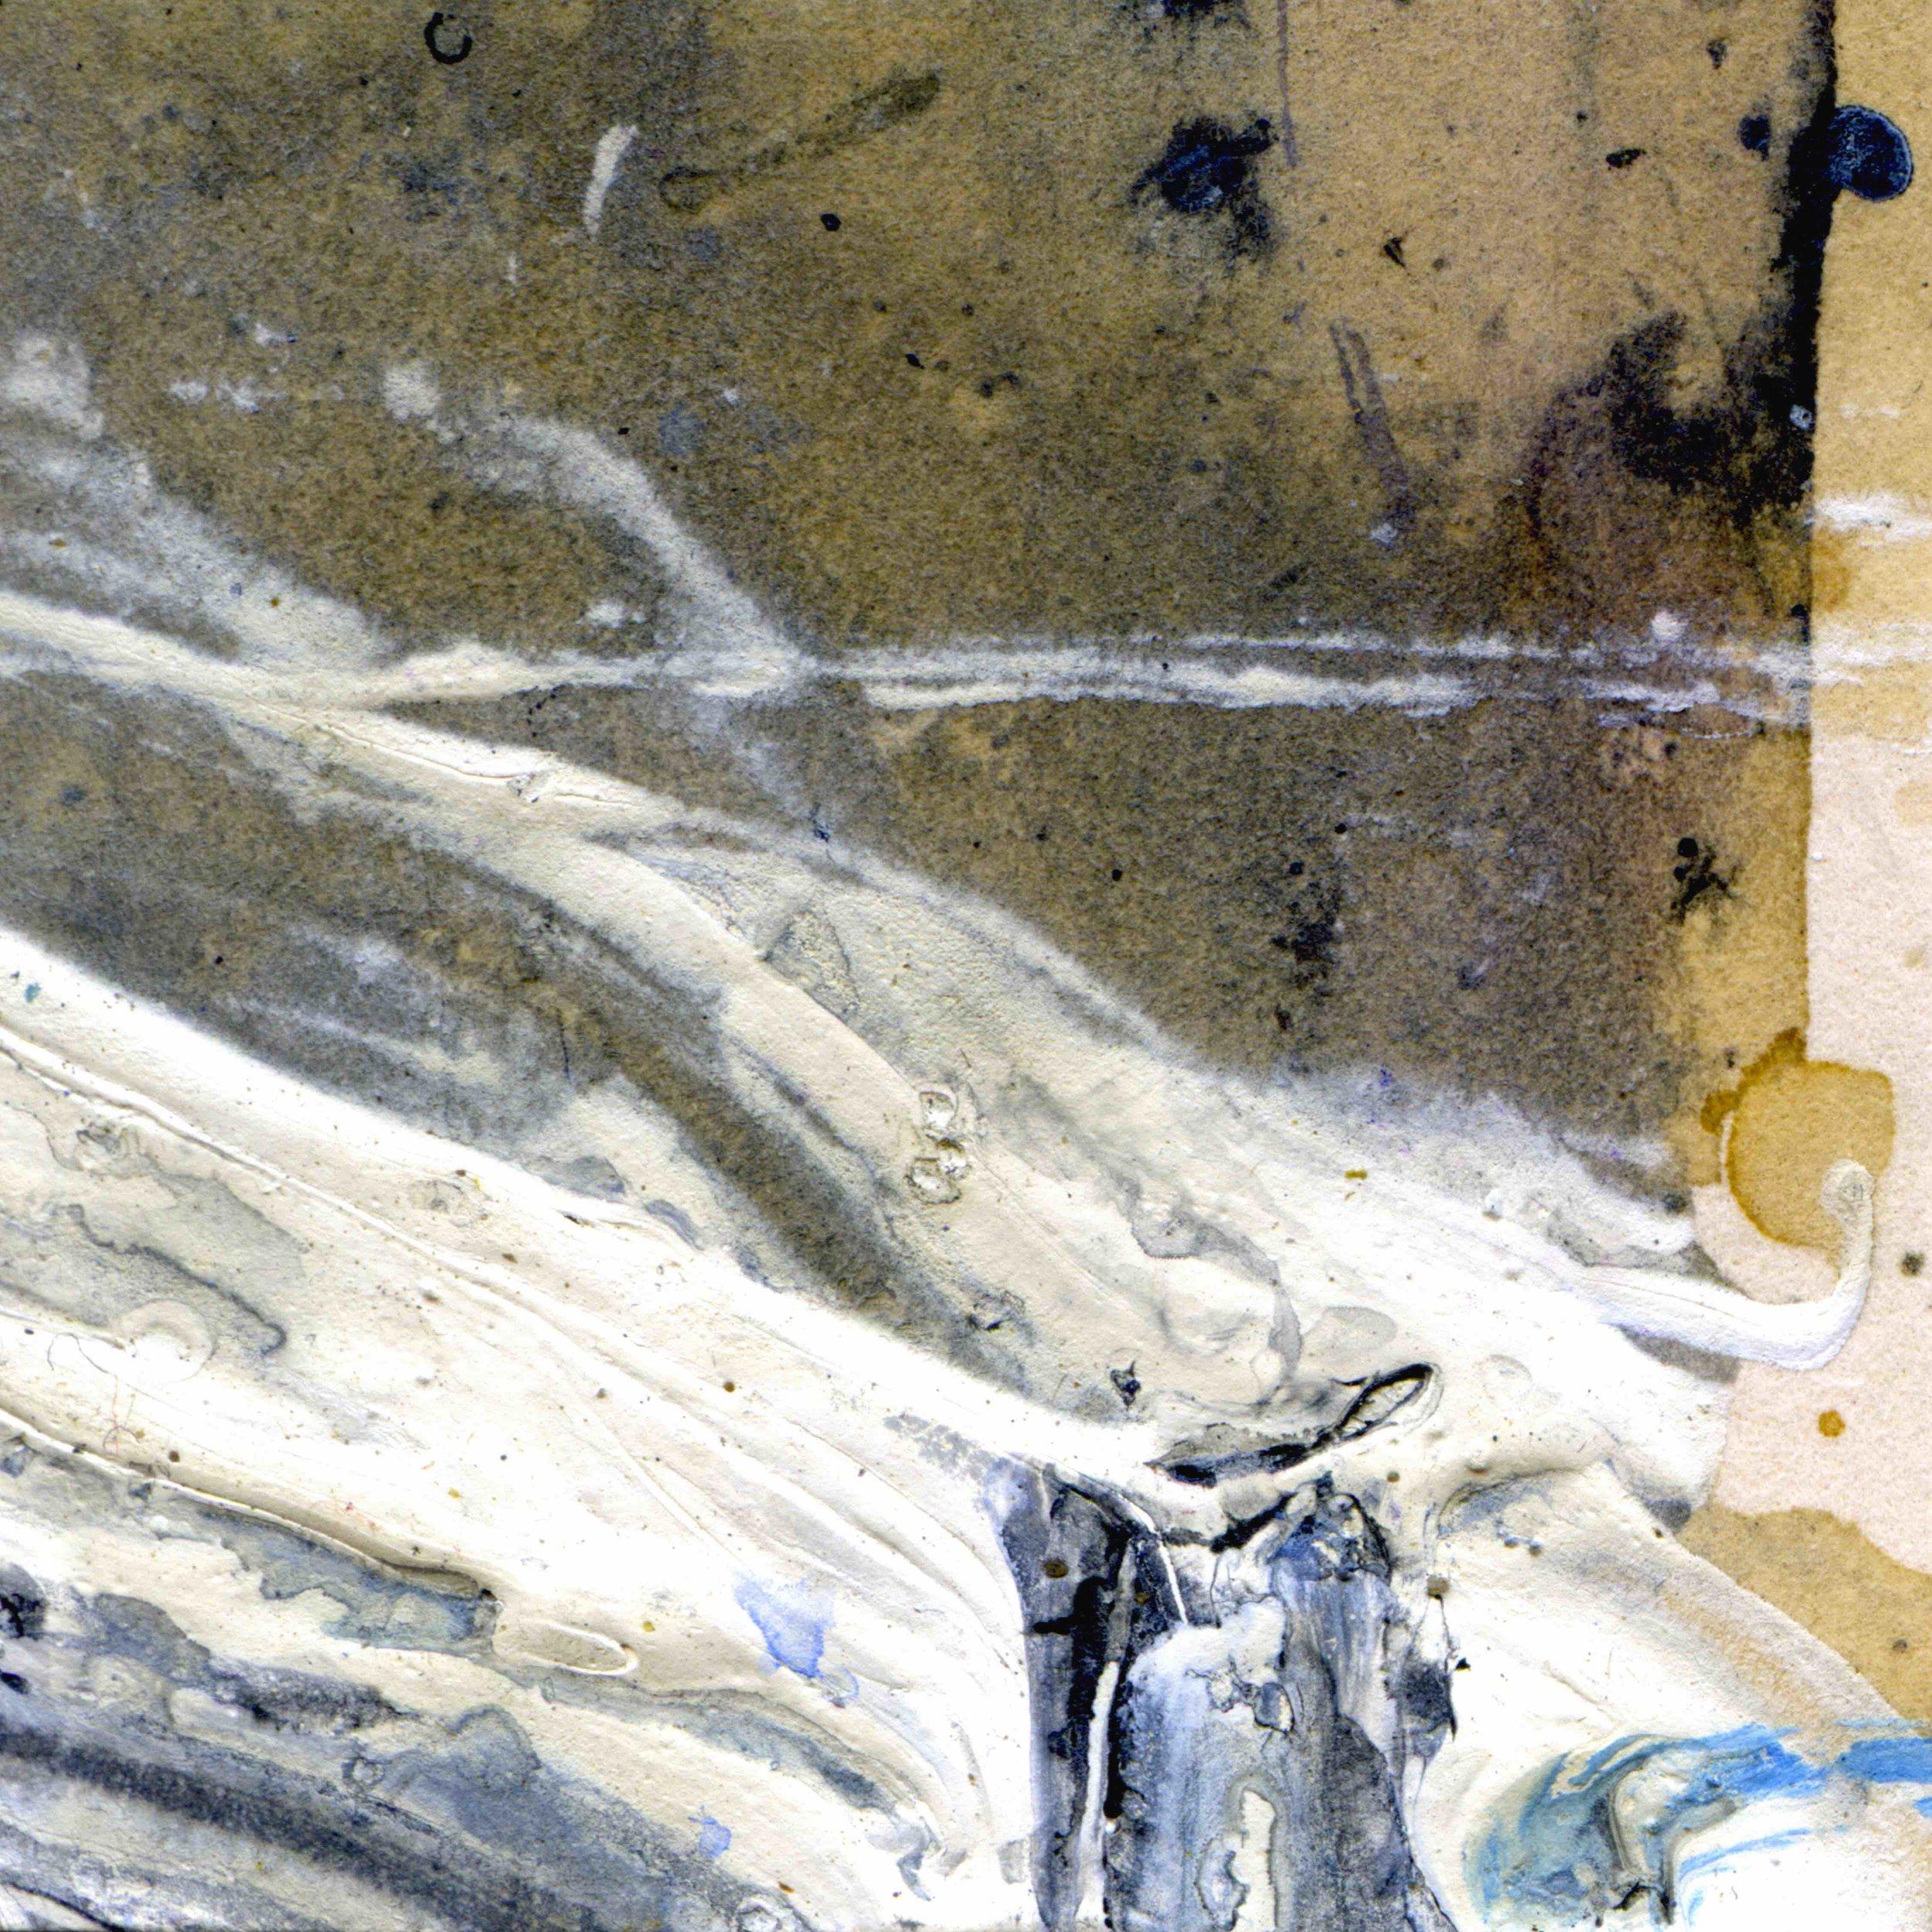 Hawkesbury River Series : S : digital print on Hanumuhle art paper